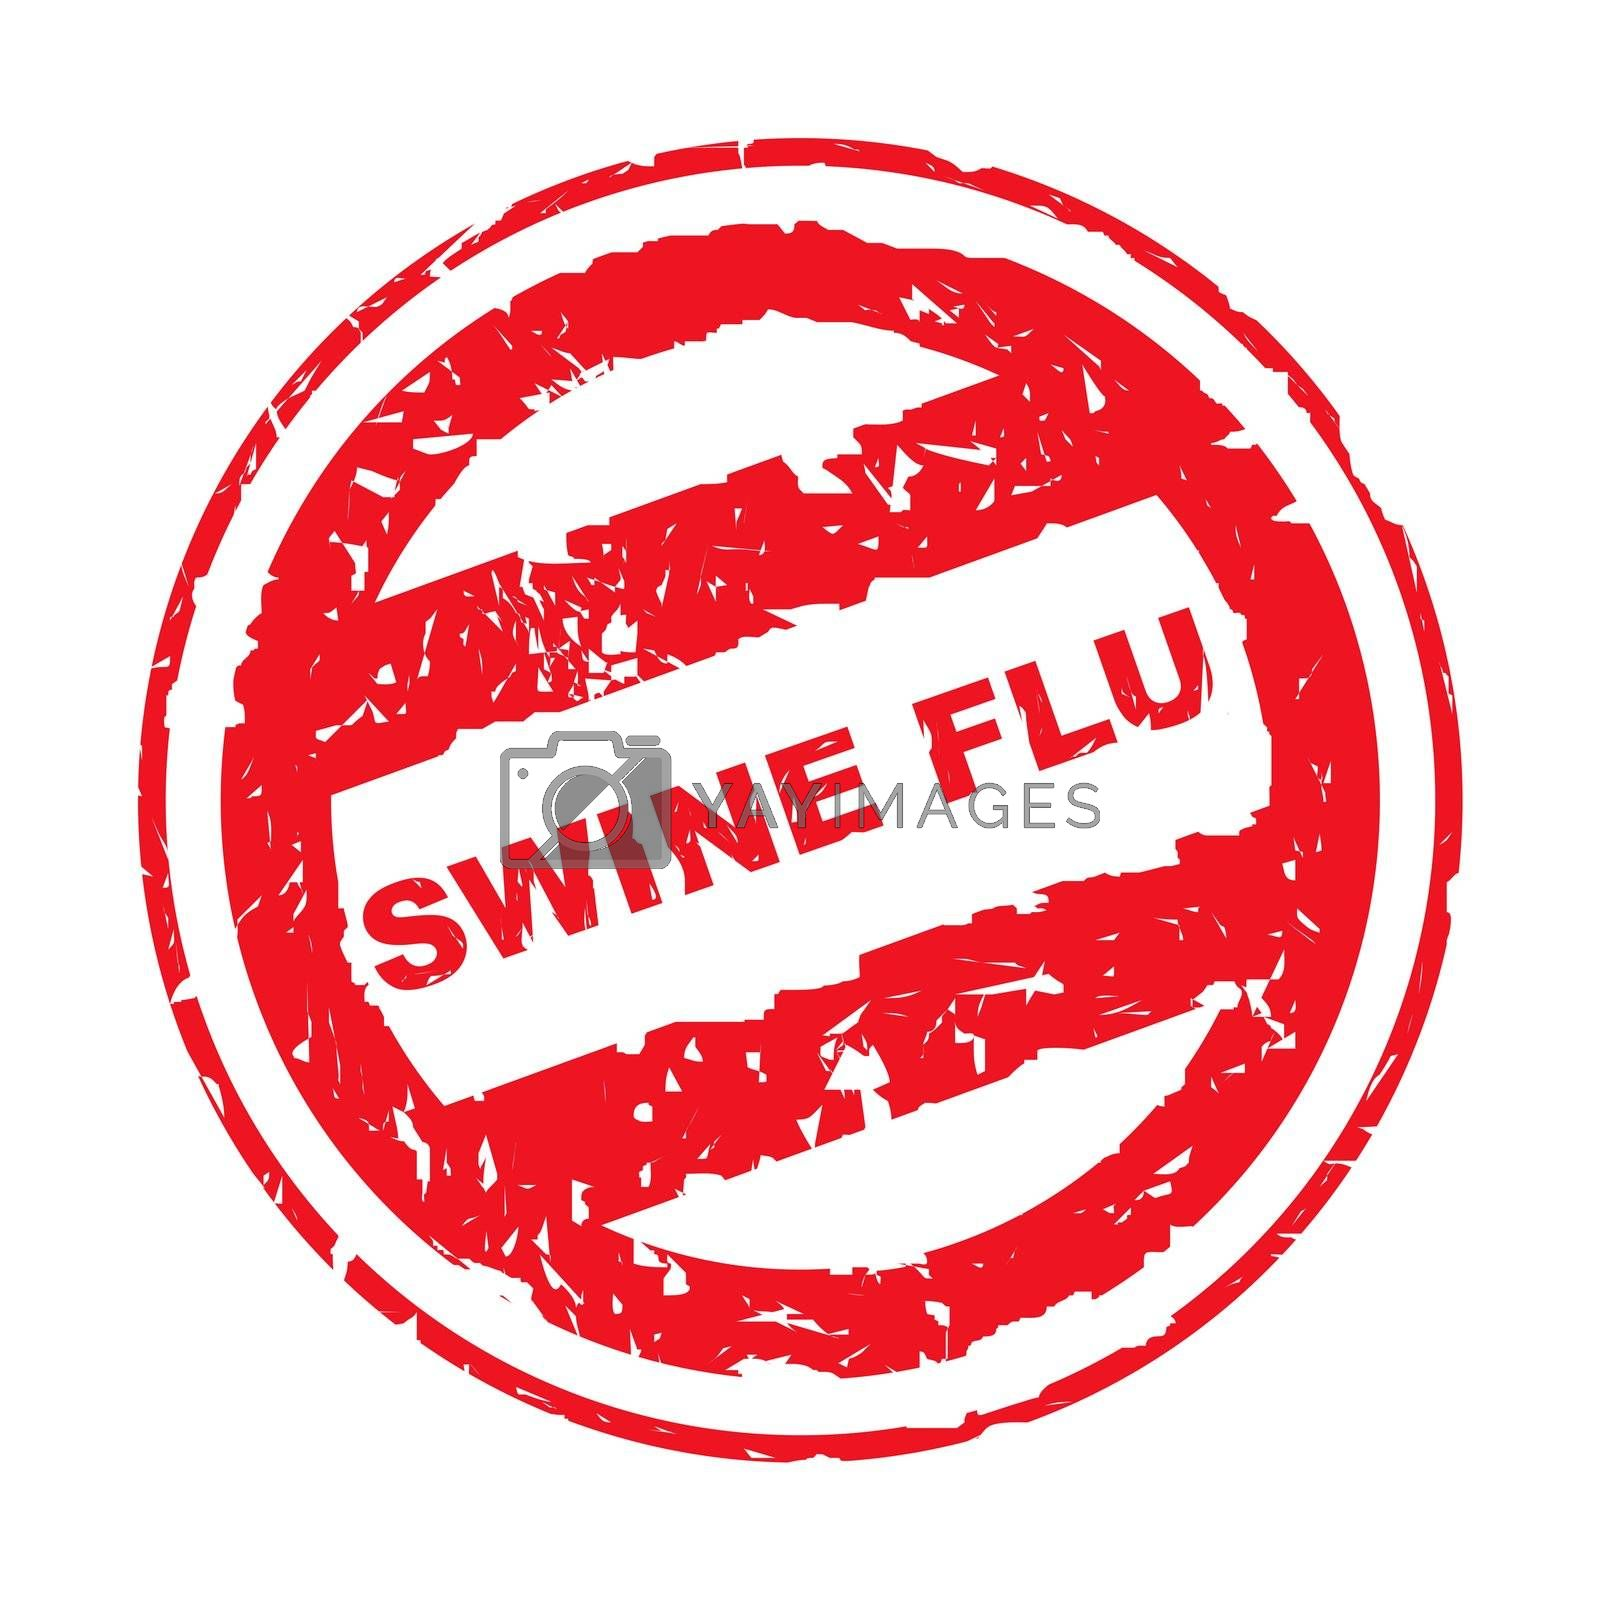 Royalty free image of Used Swine Flu stamp by speedfighter